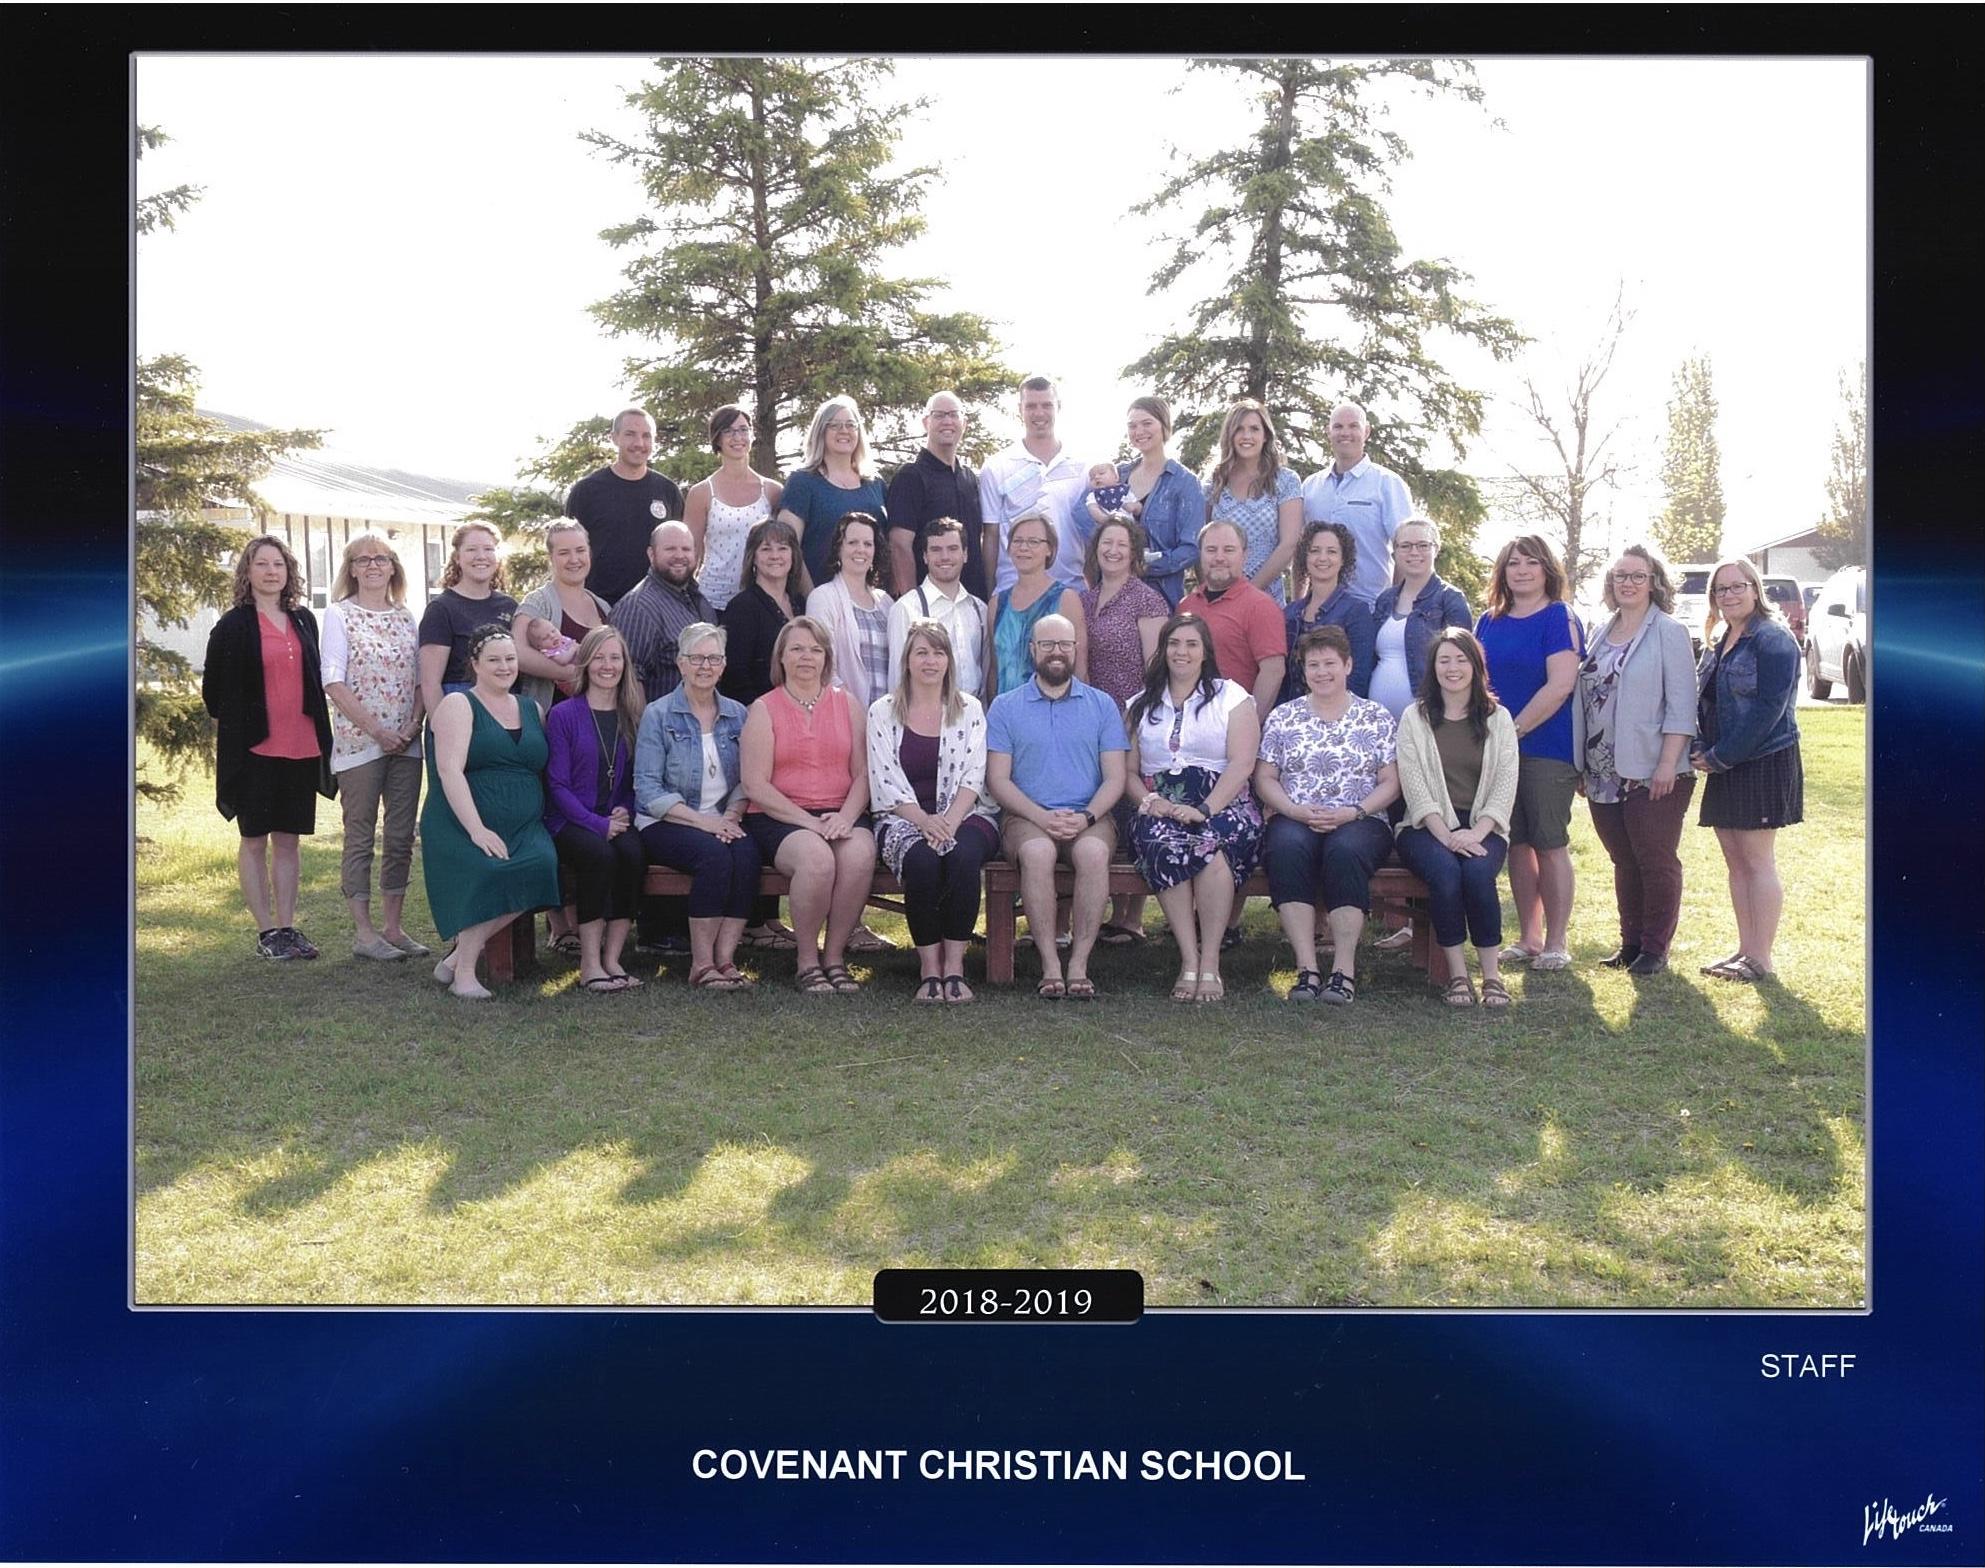 Covenant Christian School Staff